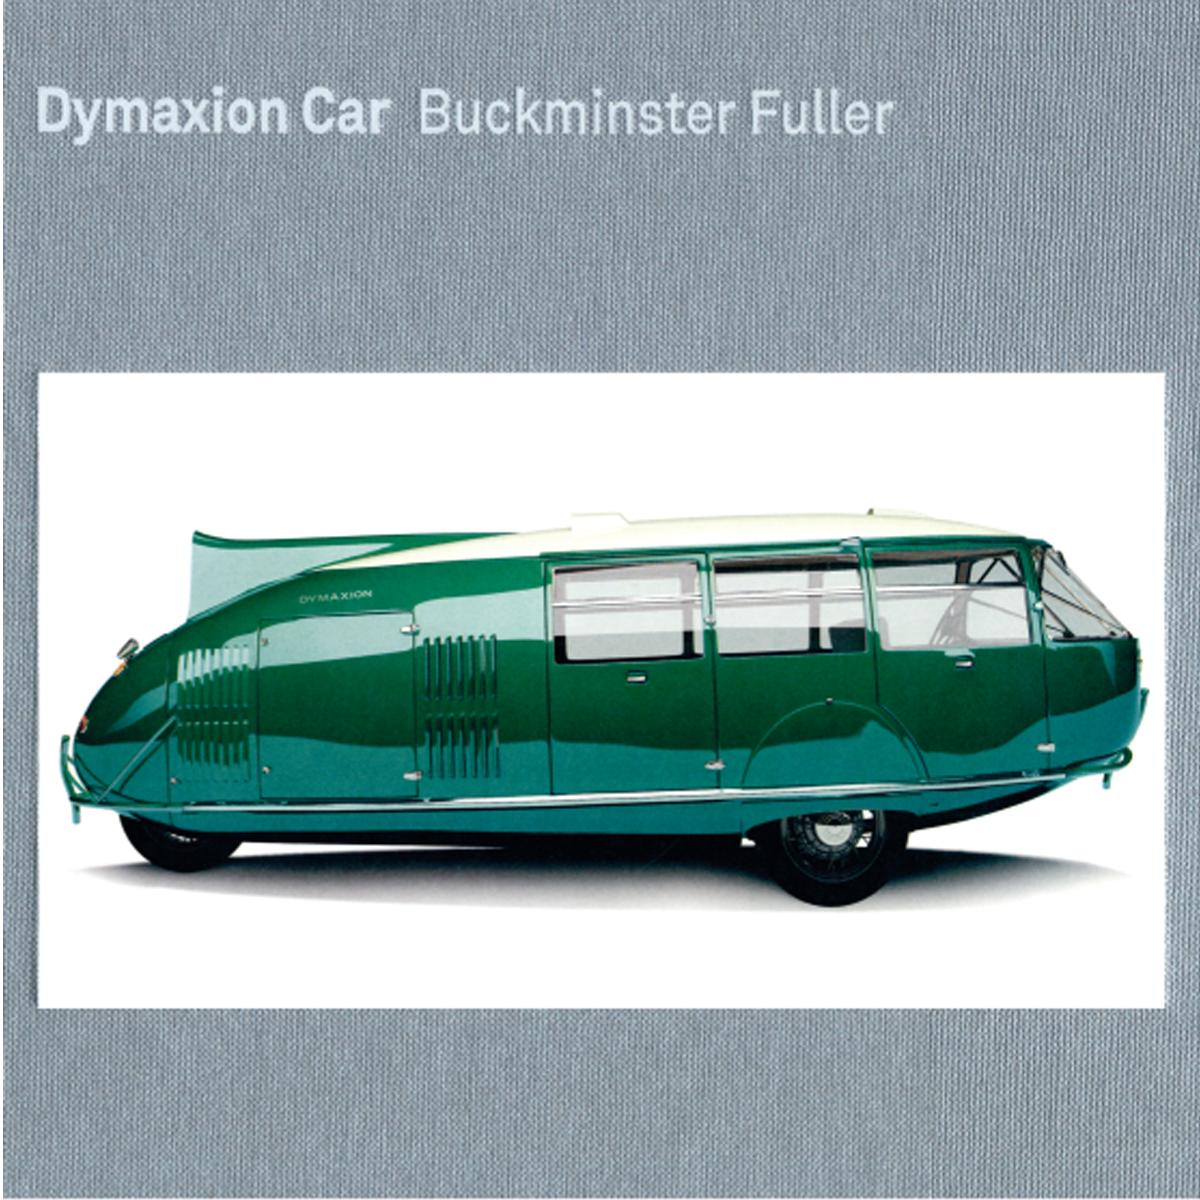 Dymaxion Car. Buckminster Fuller